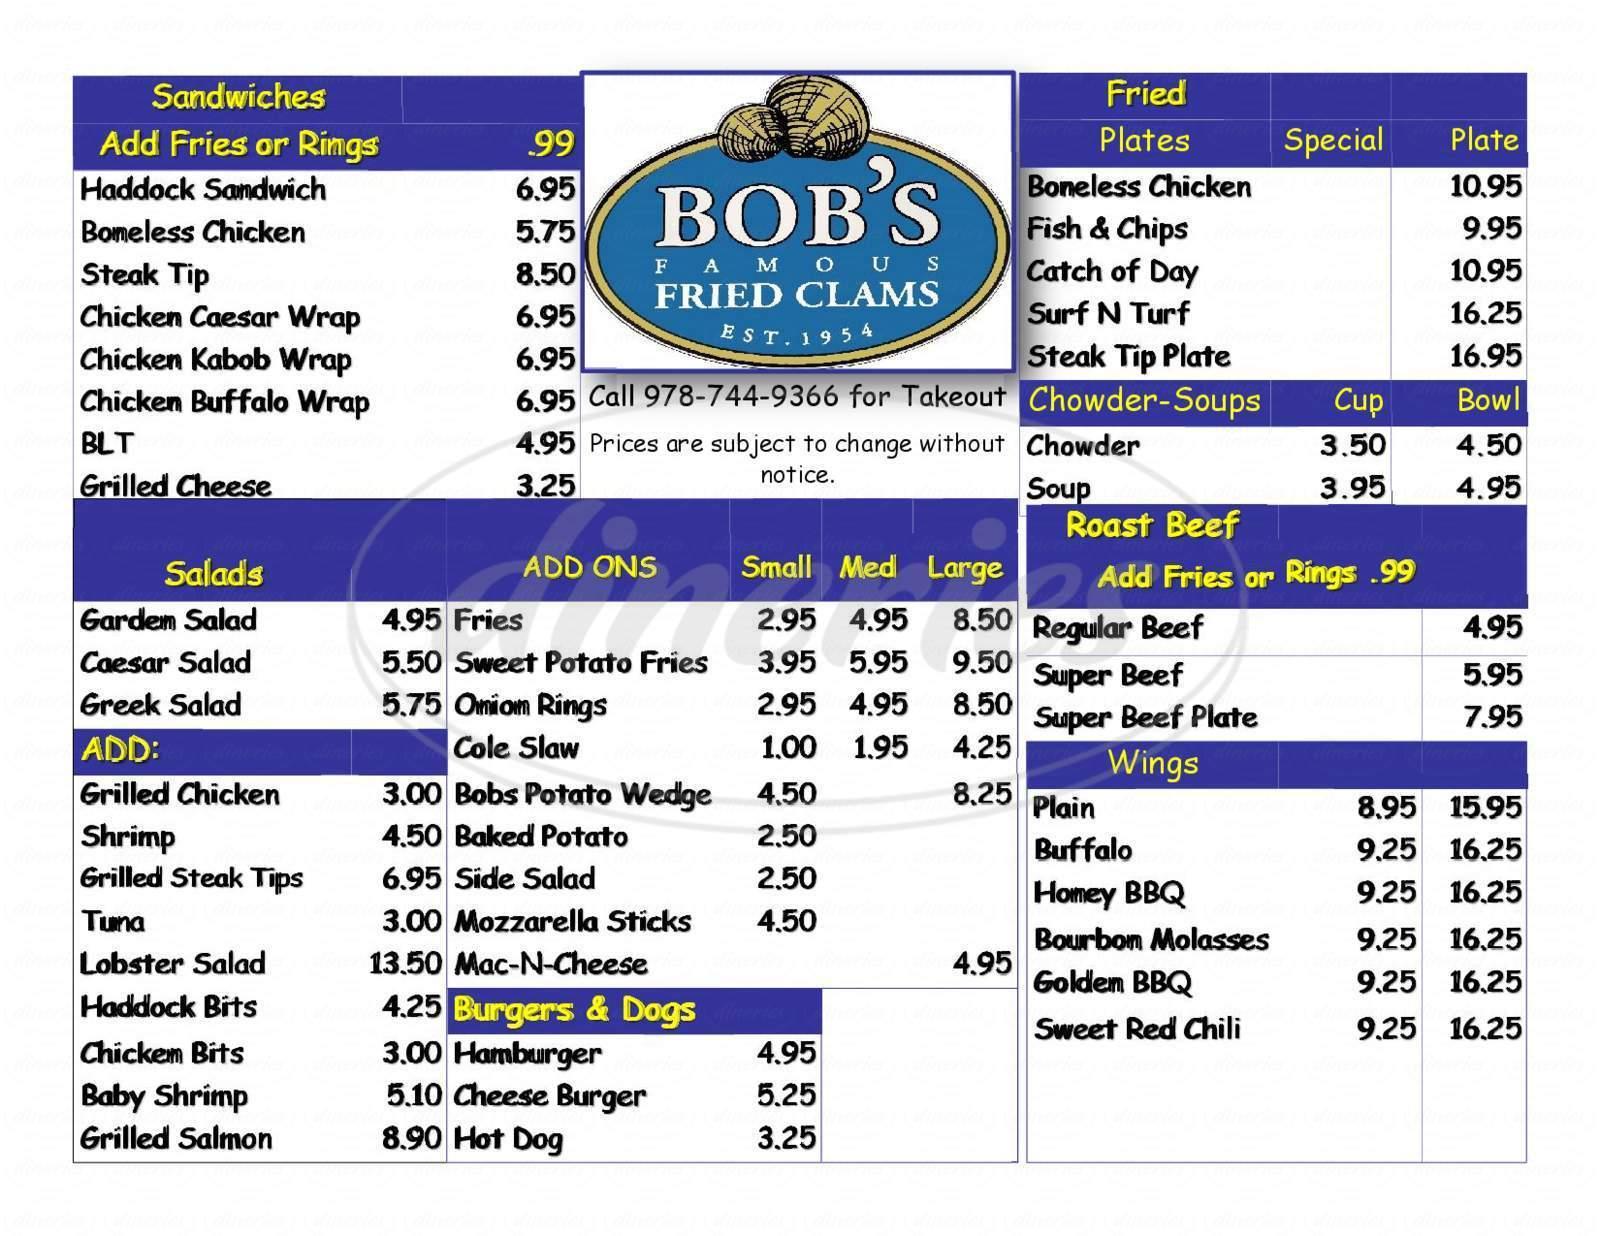 menu for Bob's Famous Fried Clams